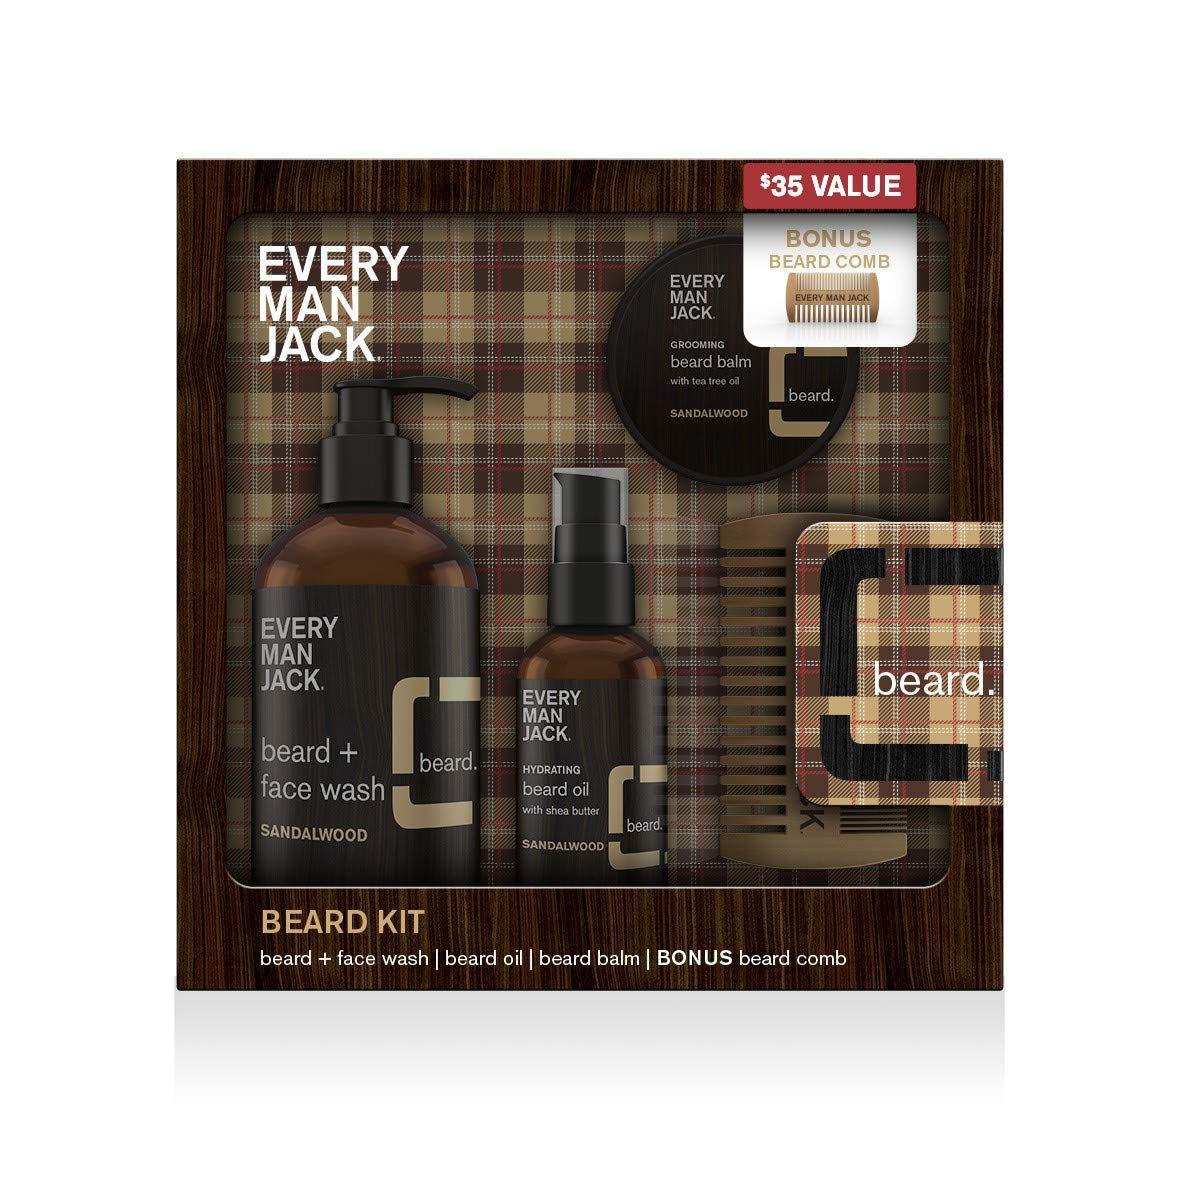 Every Man Jack Beard Kit